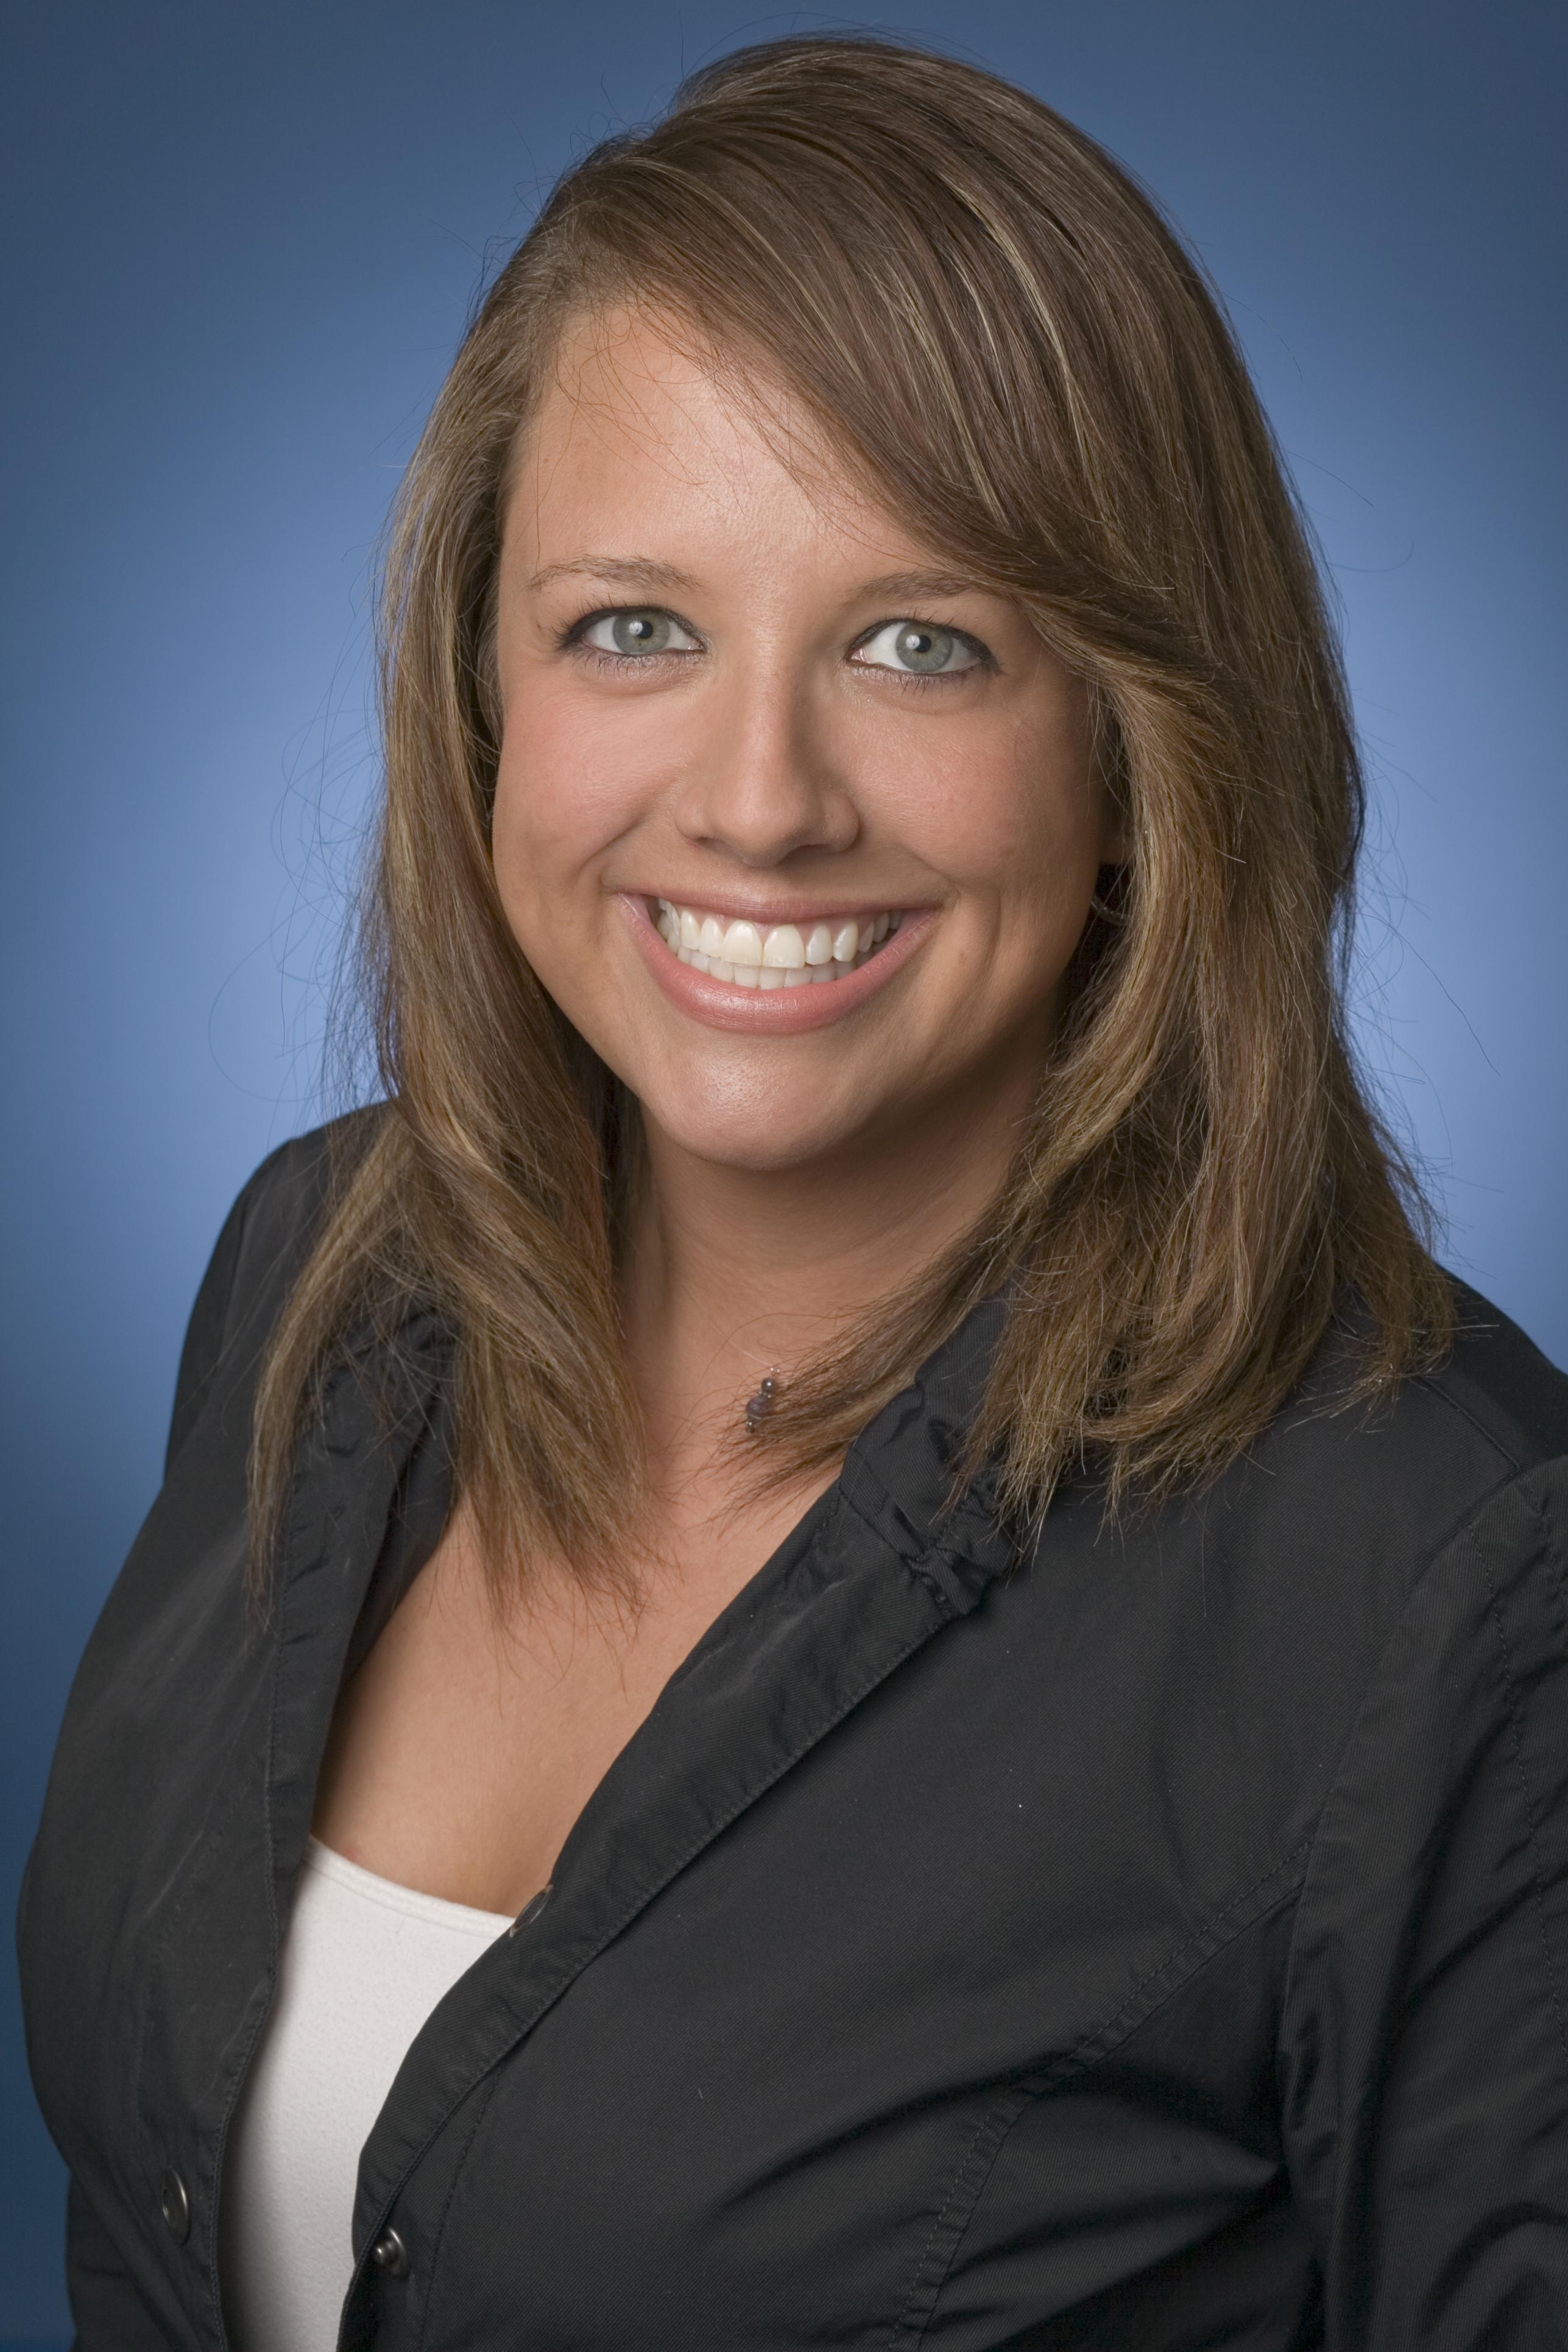 Lindsay Koch headshot